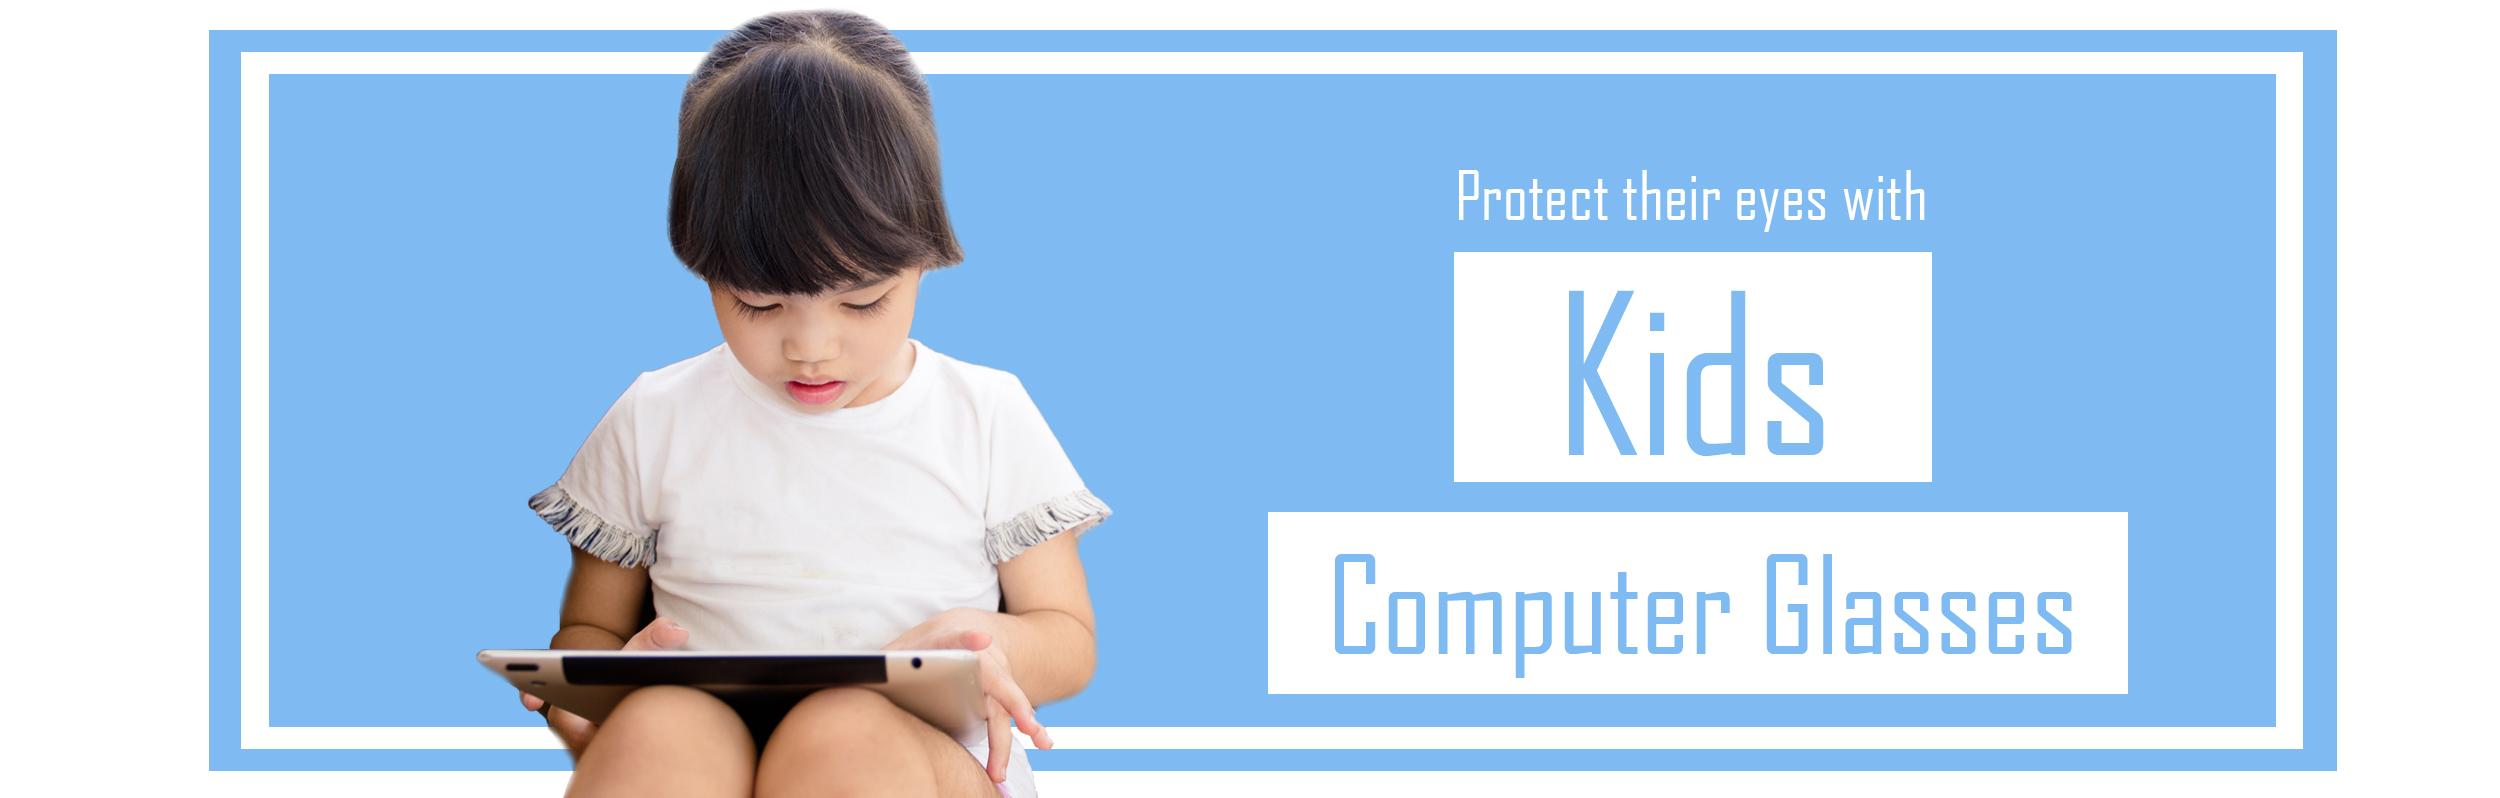 kidscomputerglassesbanner.jpg